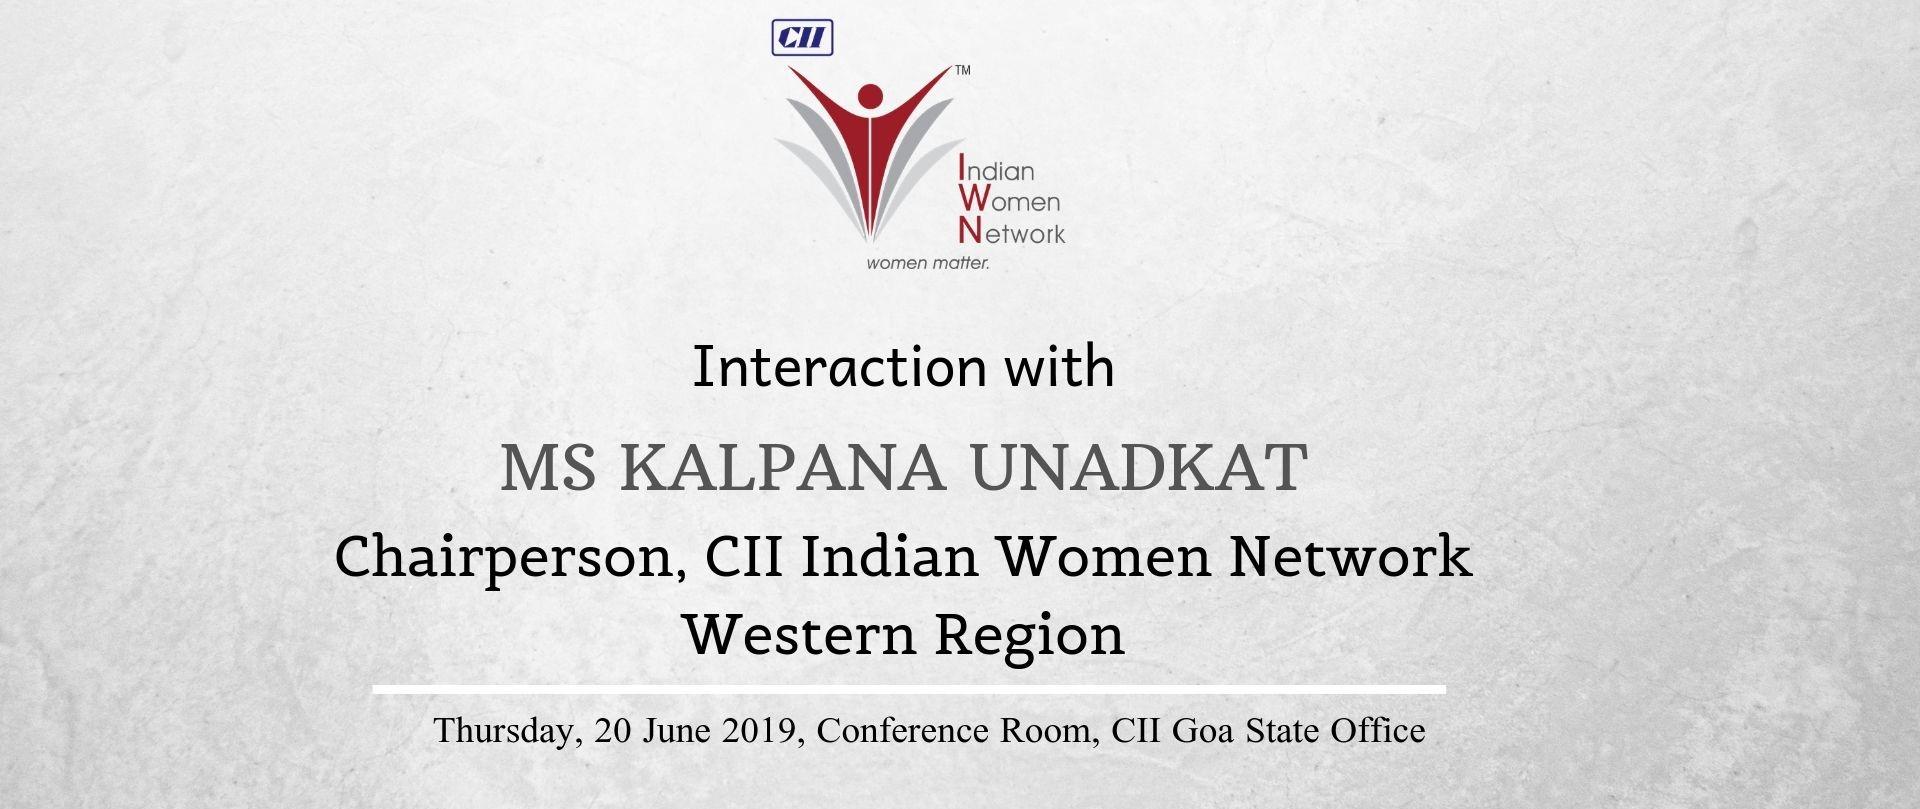 Interaction with Ms Kalpana Unadkat Chairperson, CII Indian Women Network - Western Region